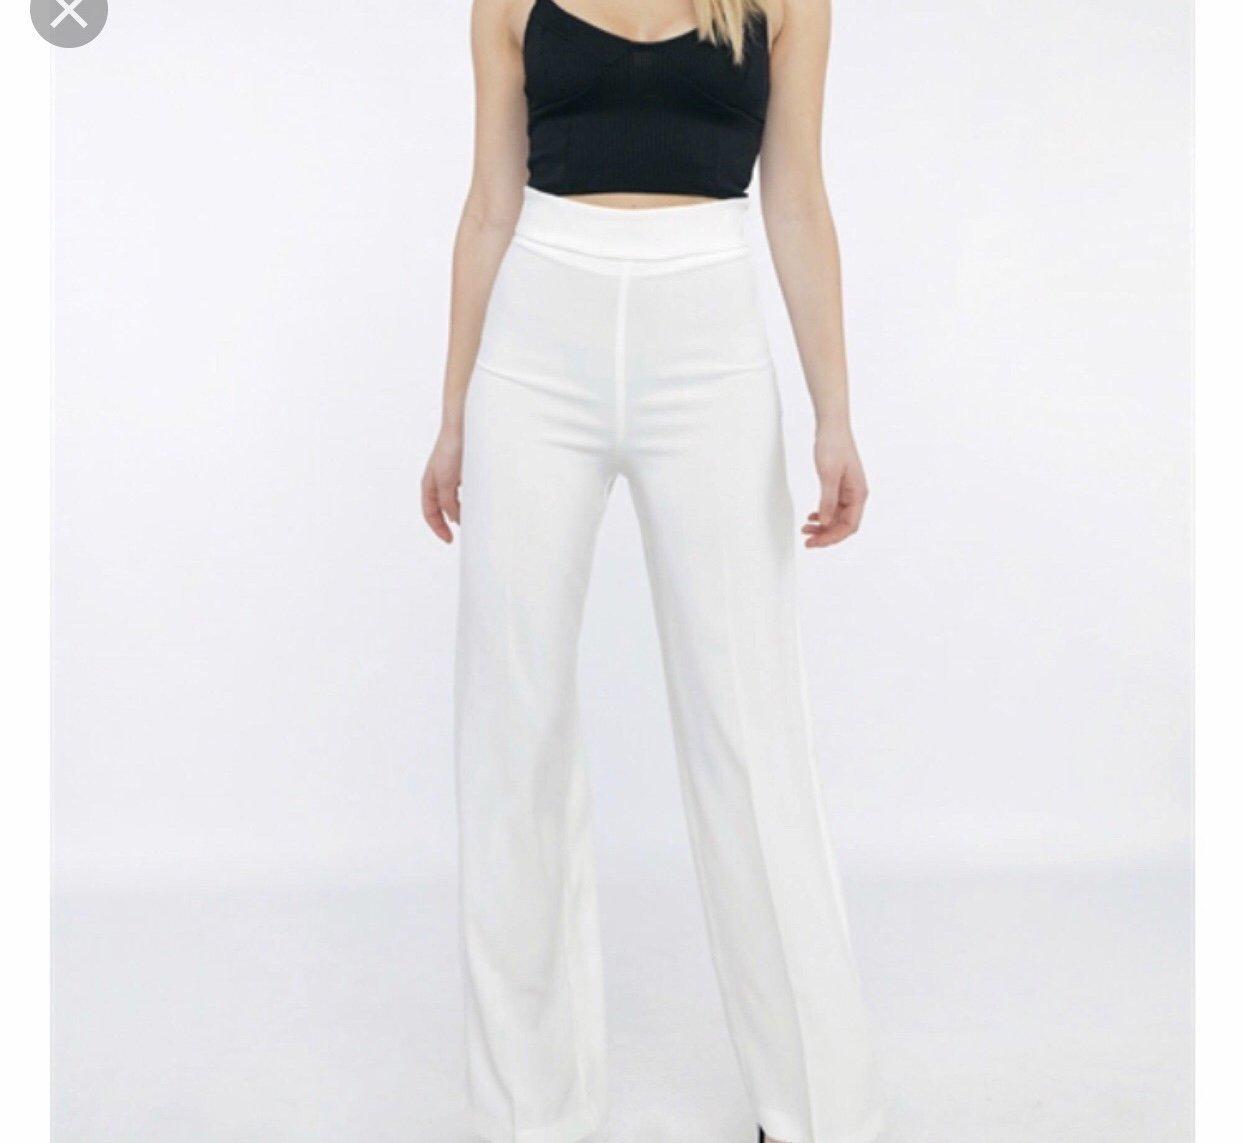 vita bootcut kostymbyxor